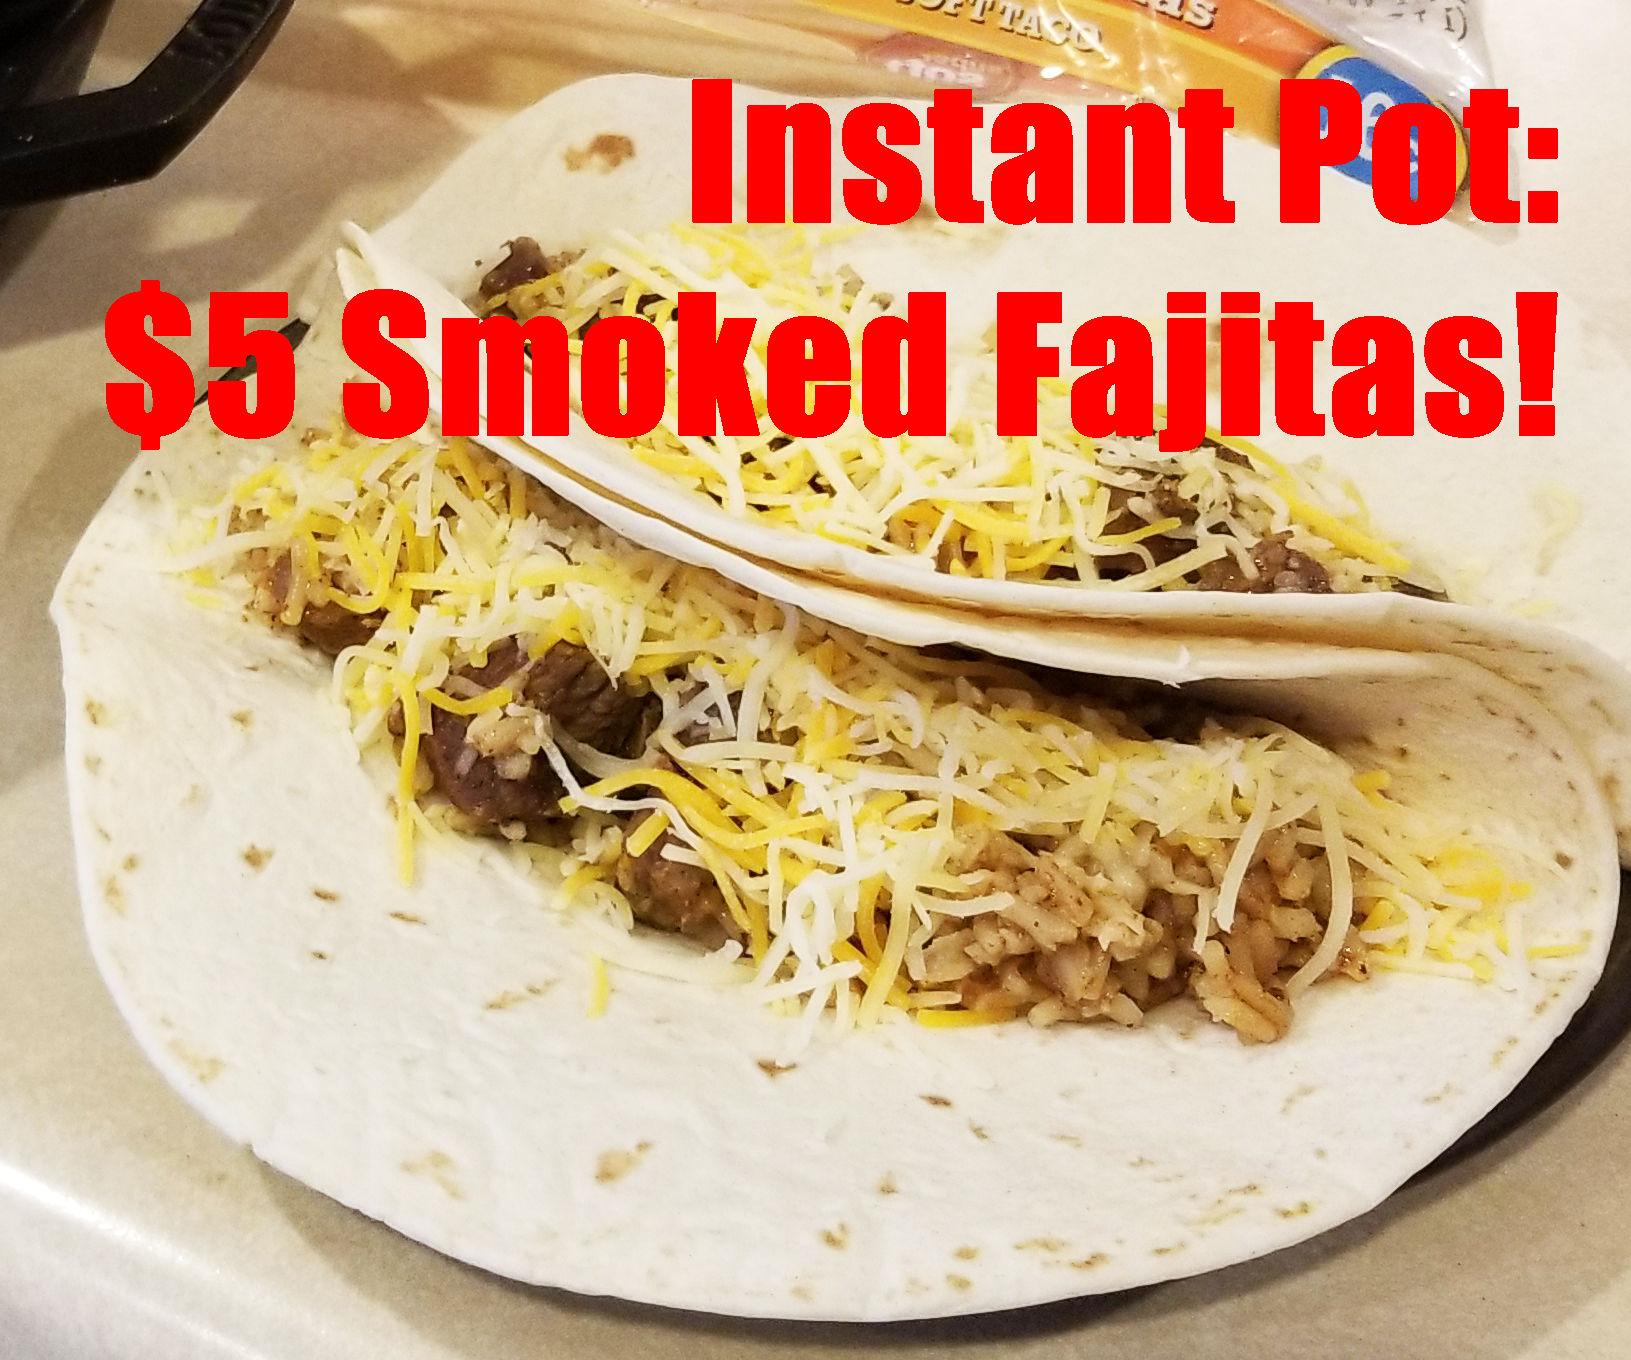 Smoked Instant Pot Fajitas